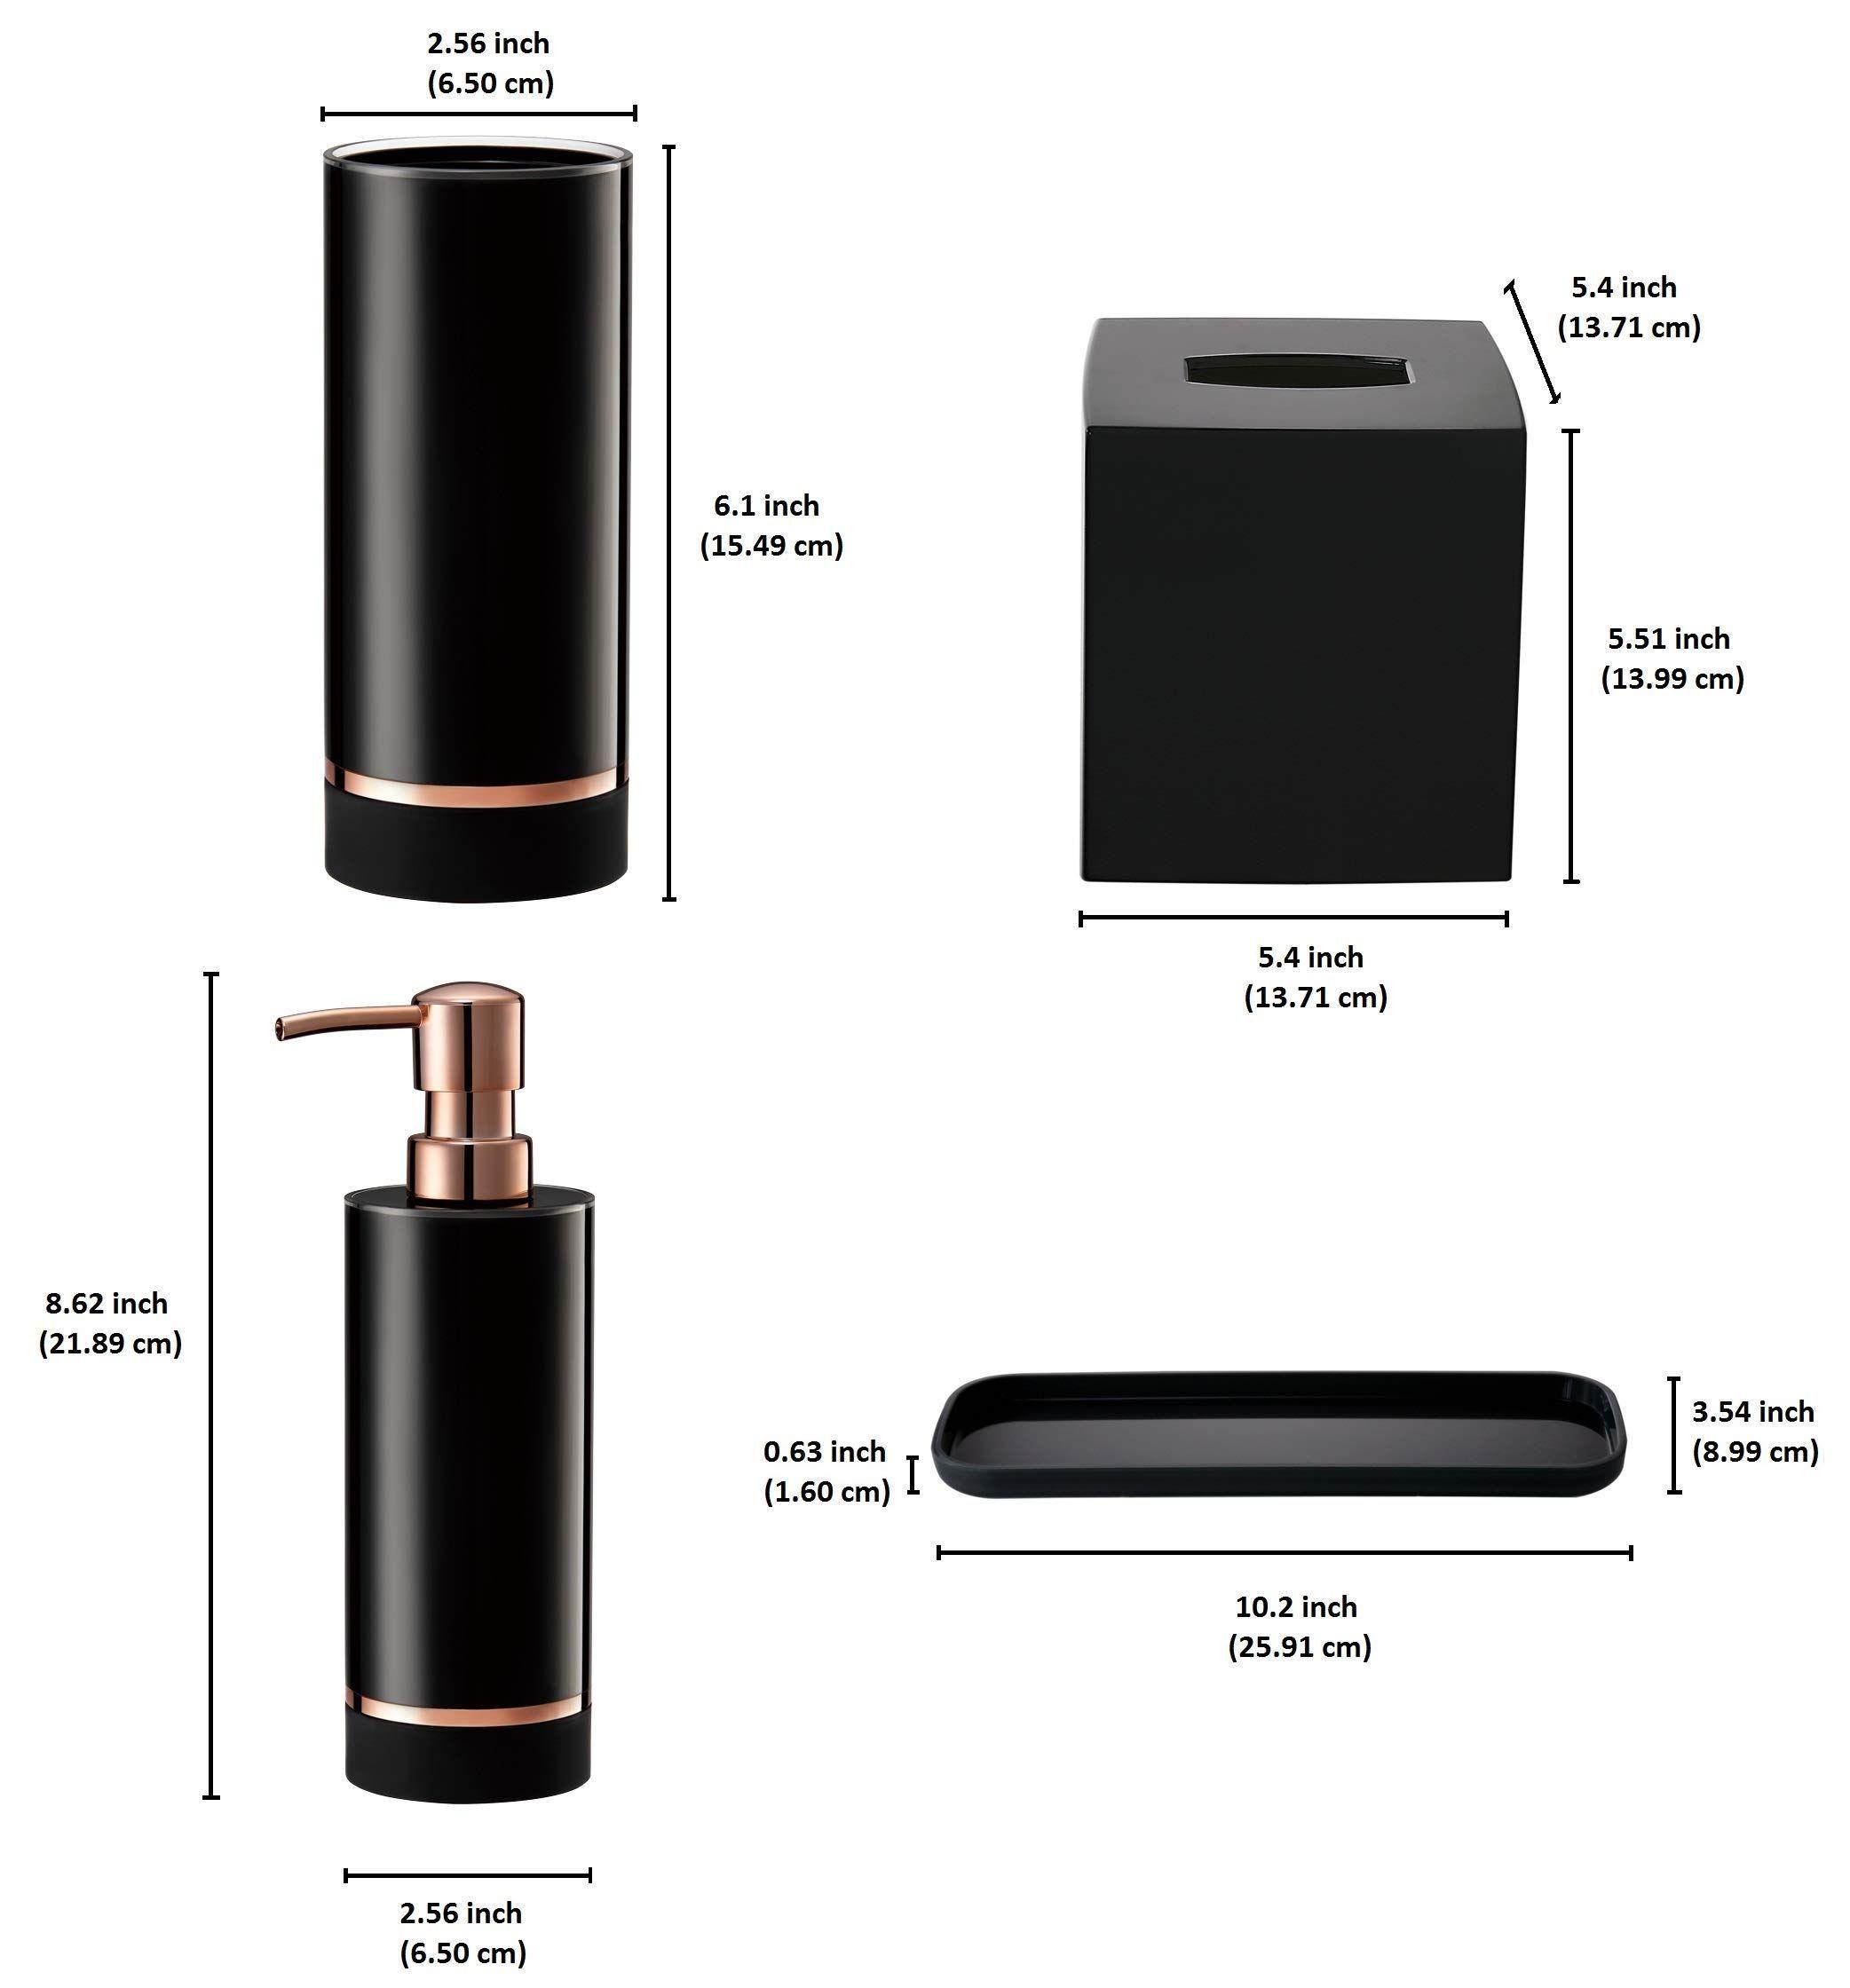 Decozen Set Of 4 Pcs Bathroom Accessories Set In Black Bright Rose Gold Strip Accent Cyli Bathroom Decor Accessories Bathroom Accessories Sets Lotion Dispenser